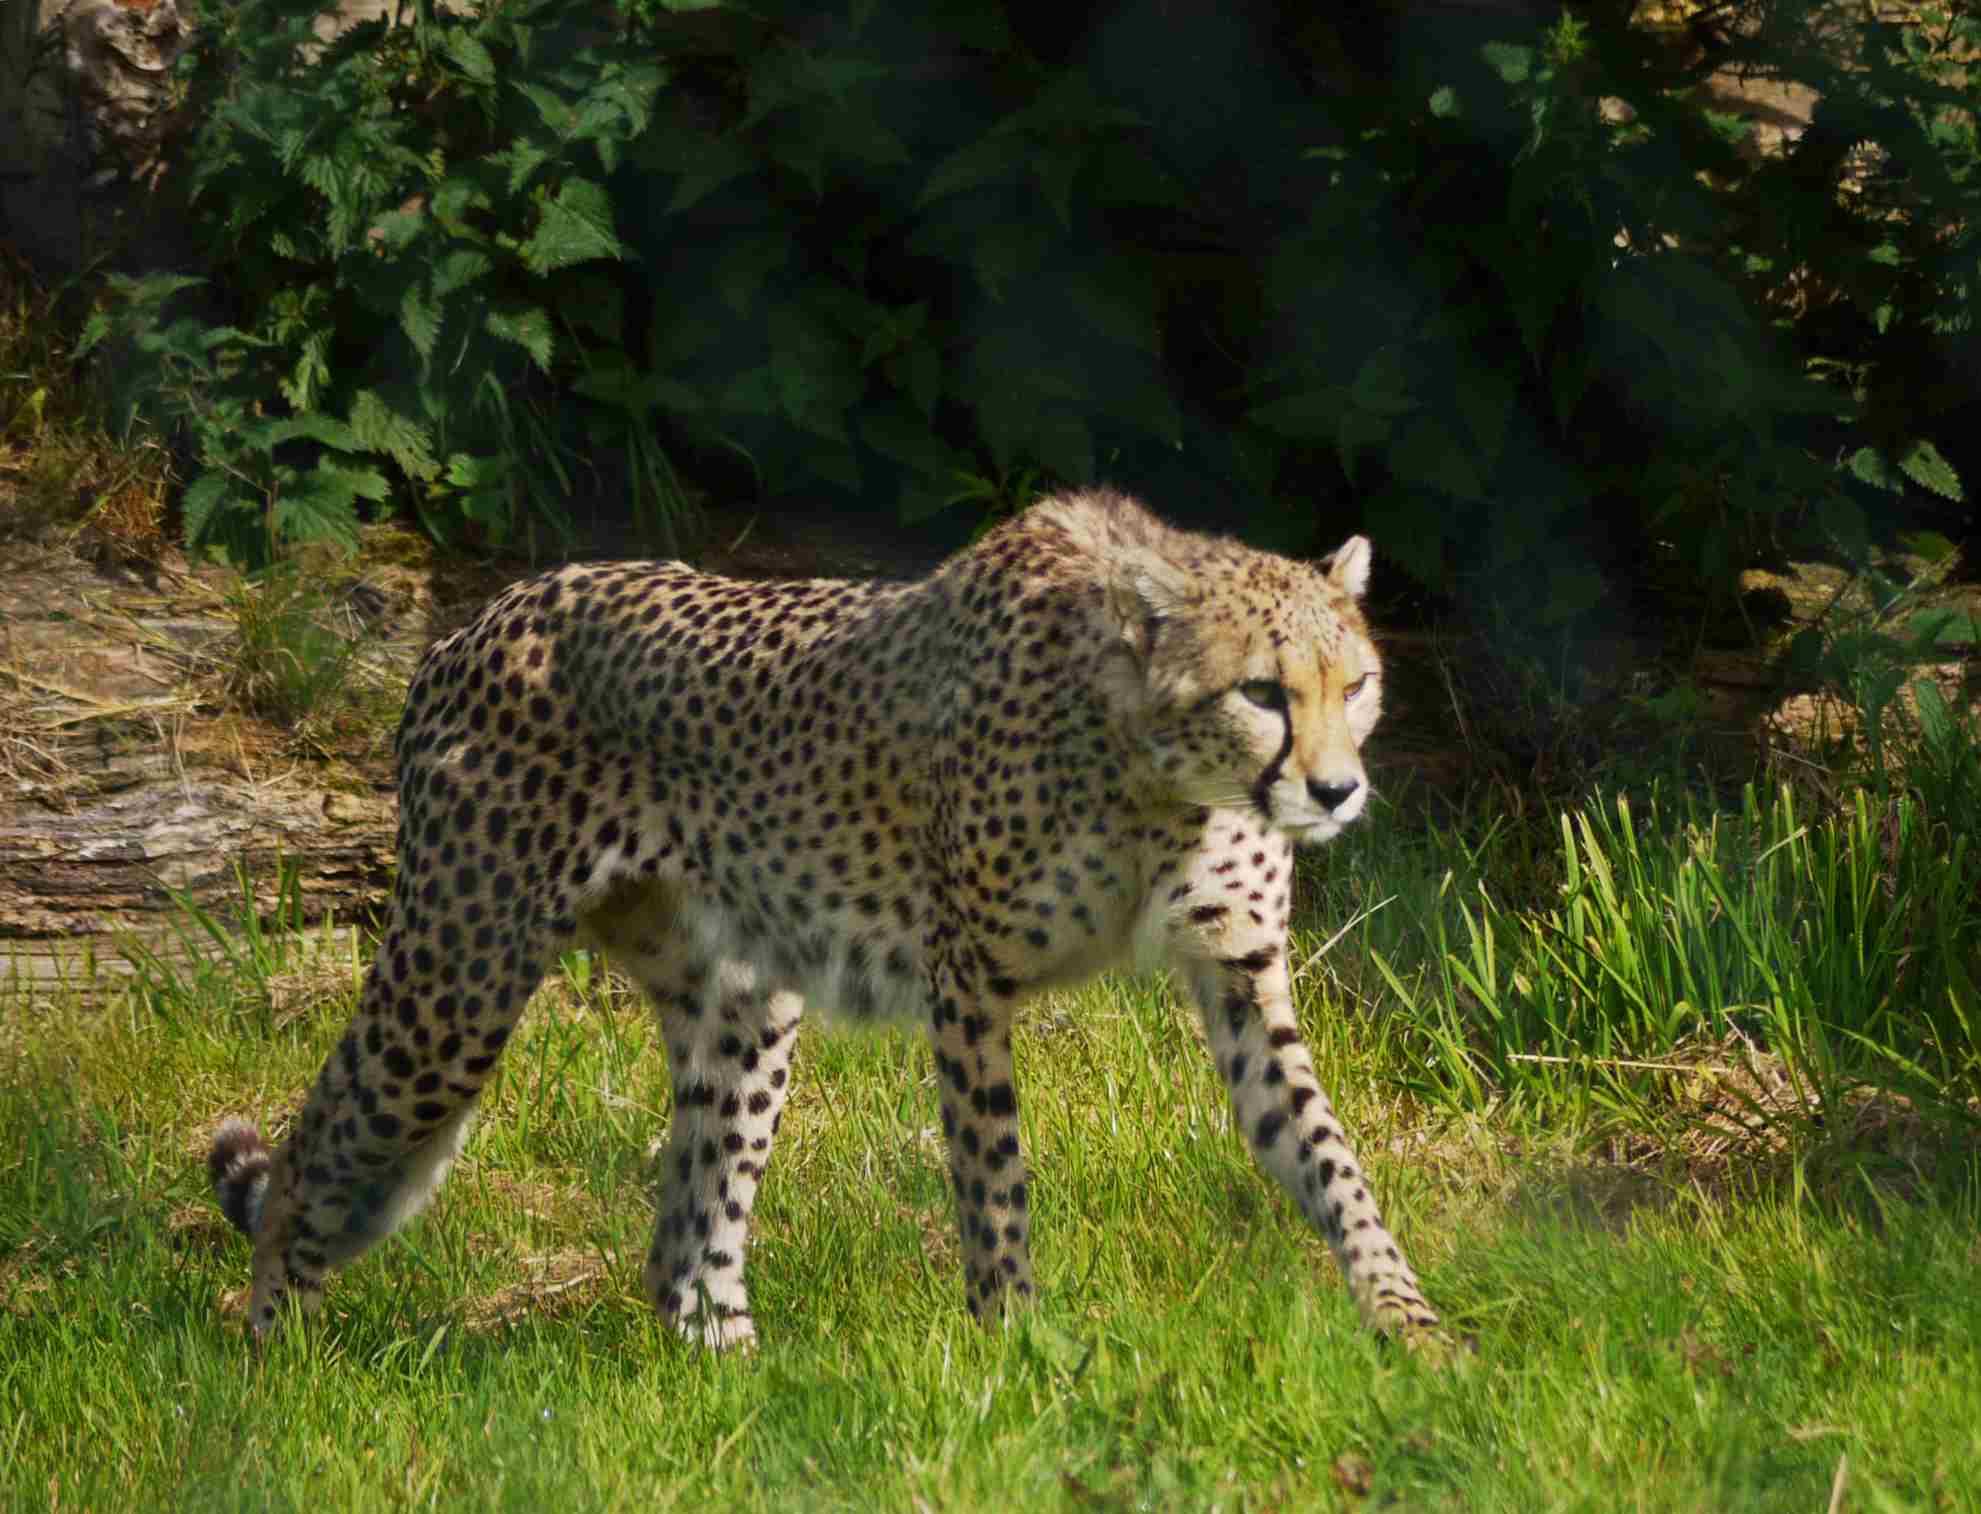 Cheetah in fota island Wildlife park